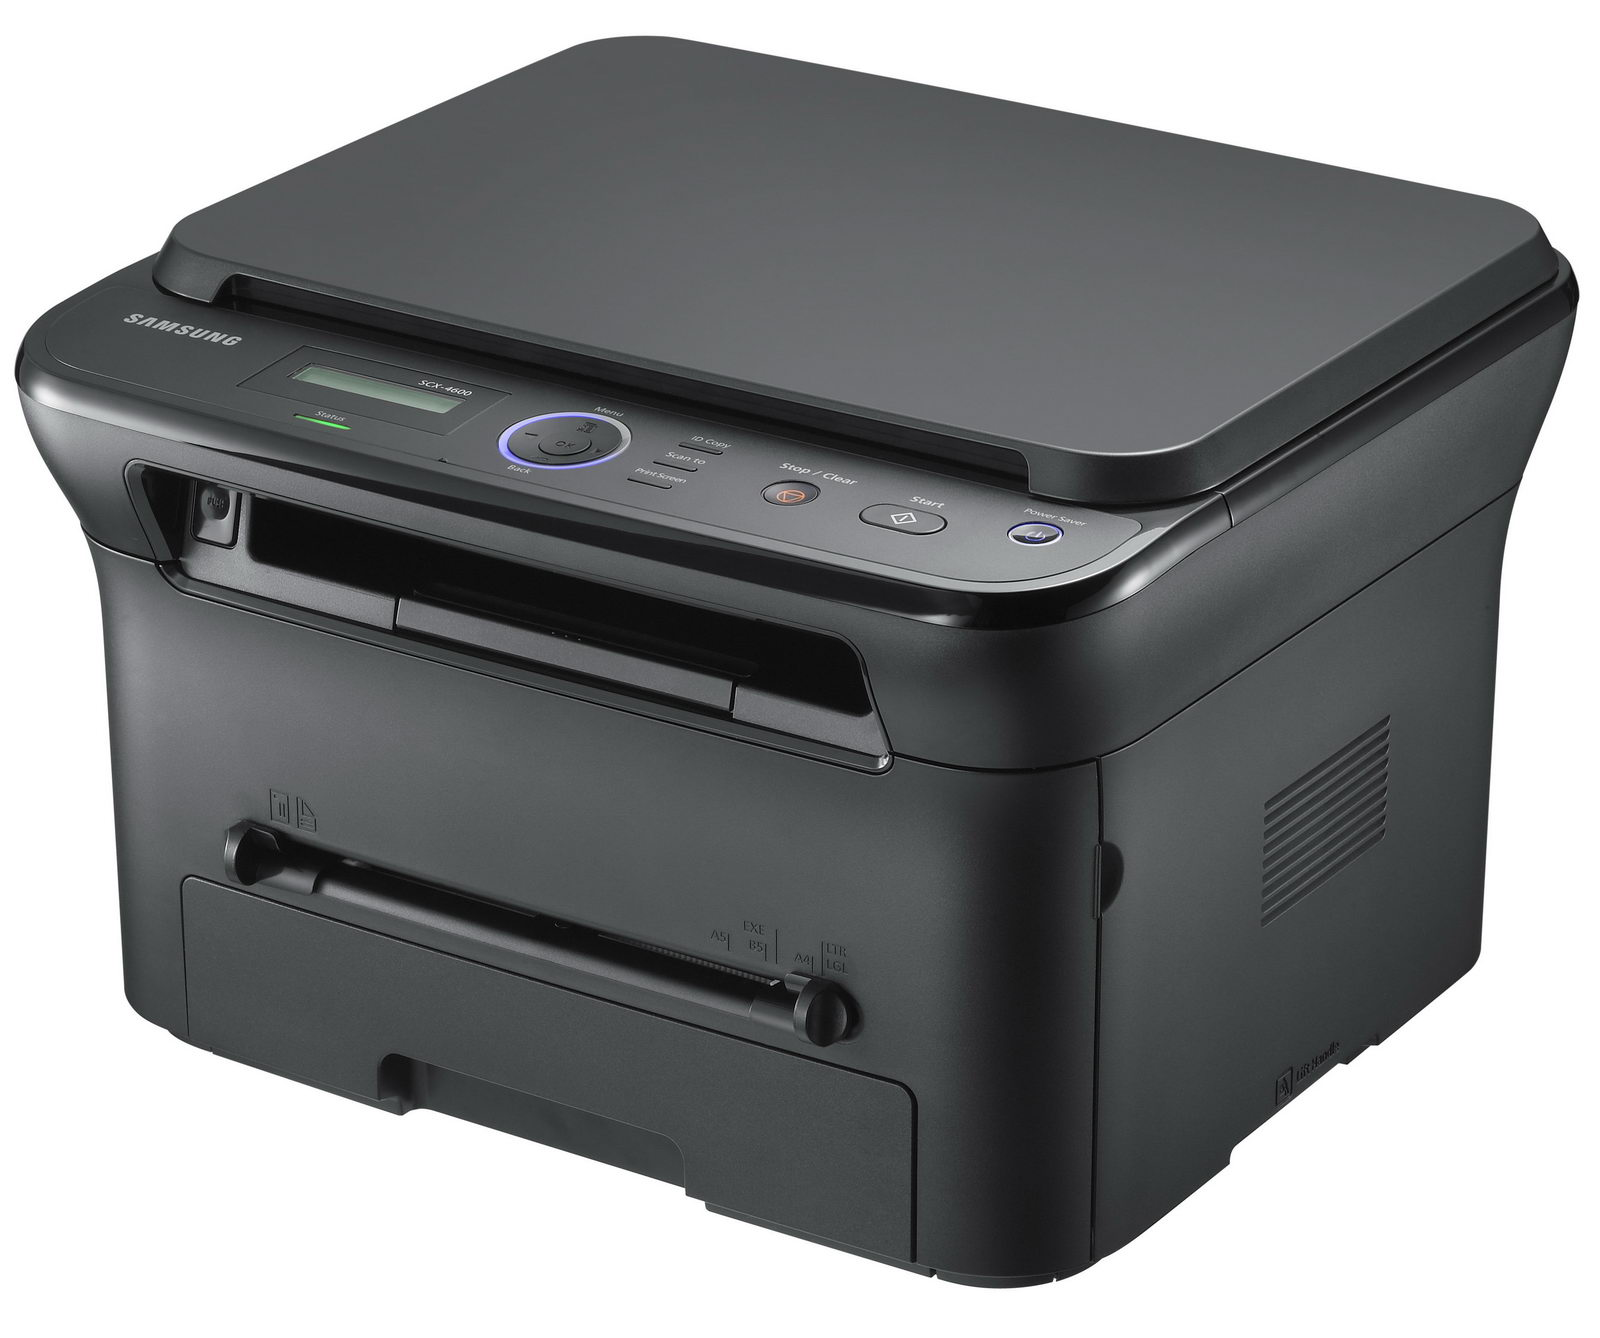 Принтер Samsung SCX-4600